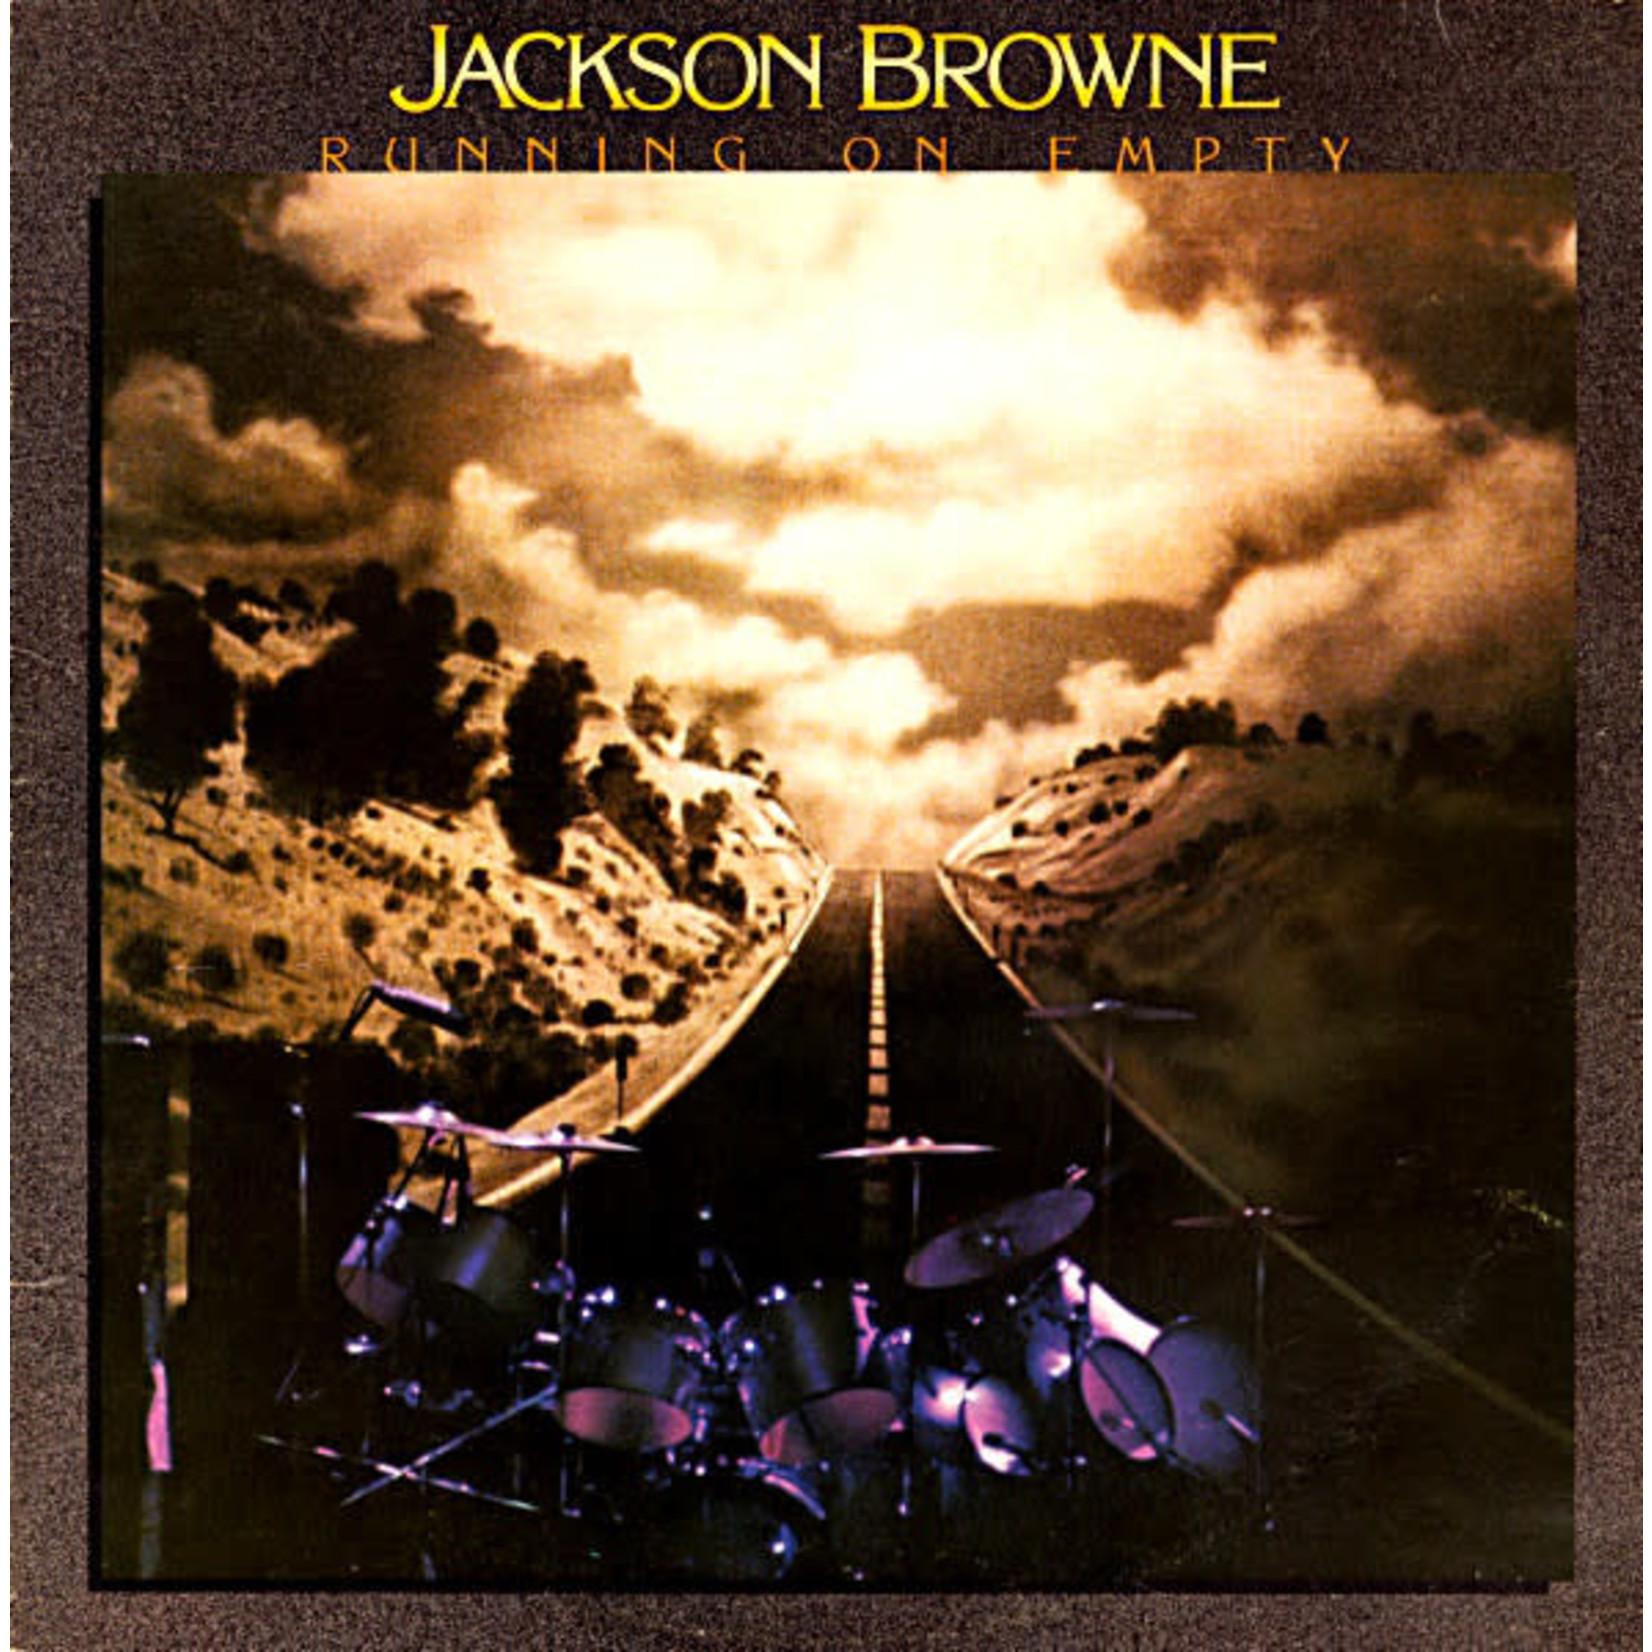 [Vintage] Browne, Jackson: Running on Empty